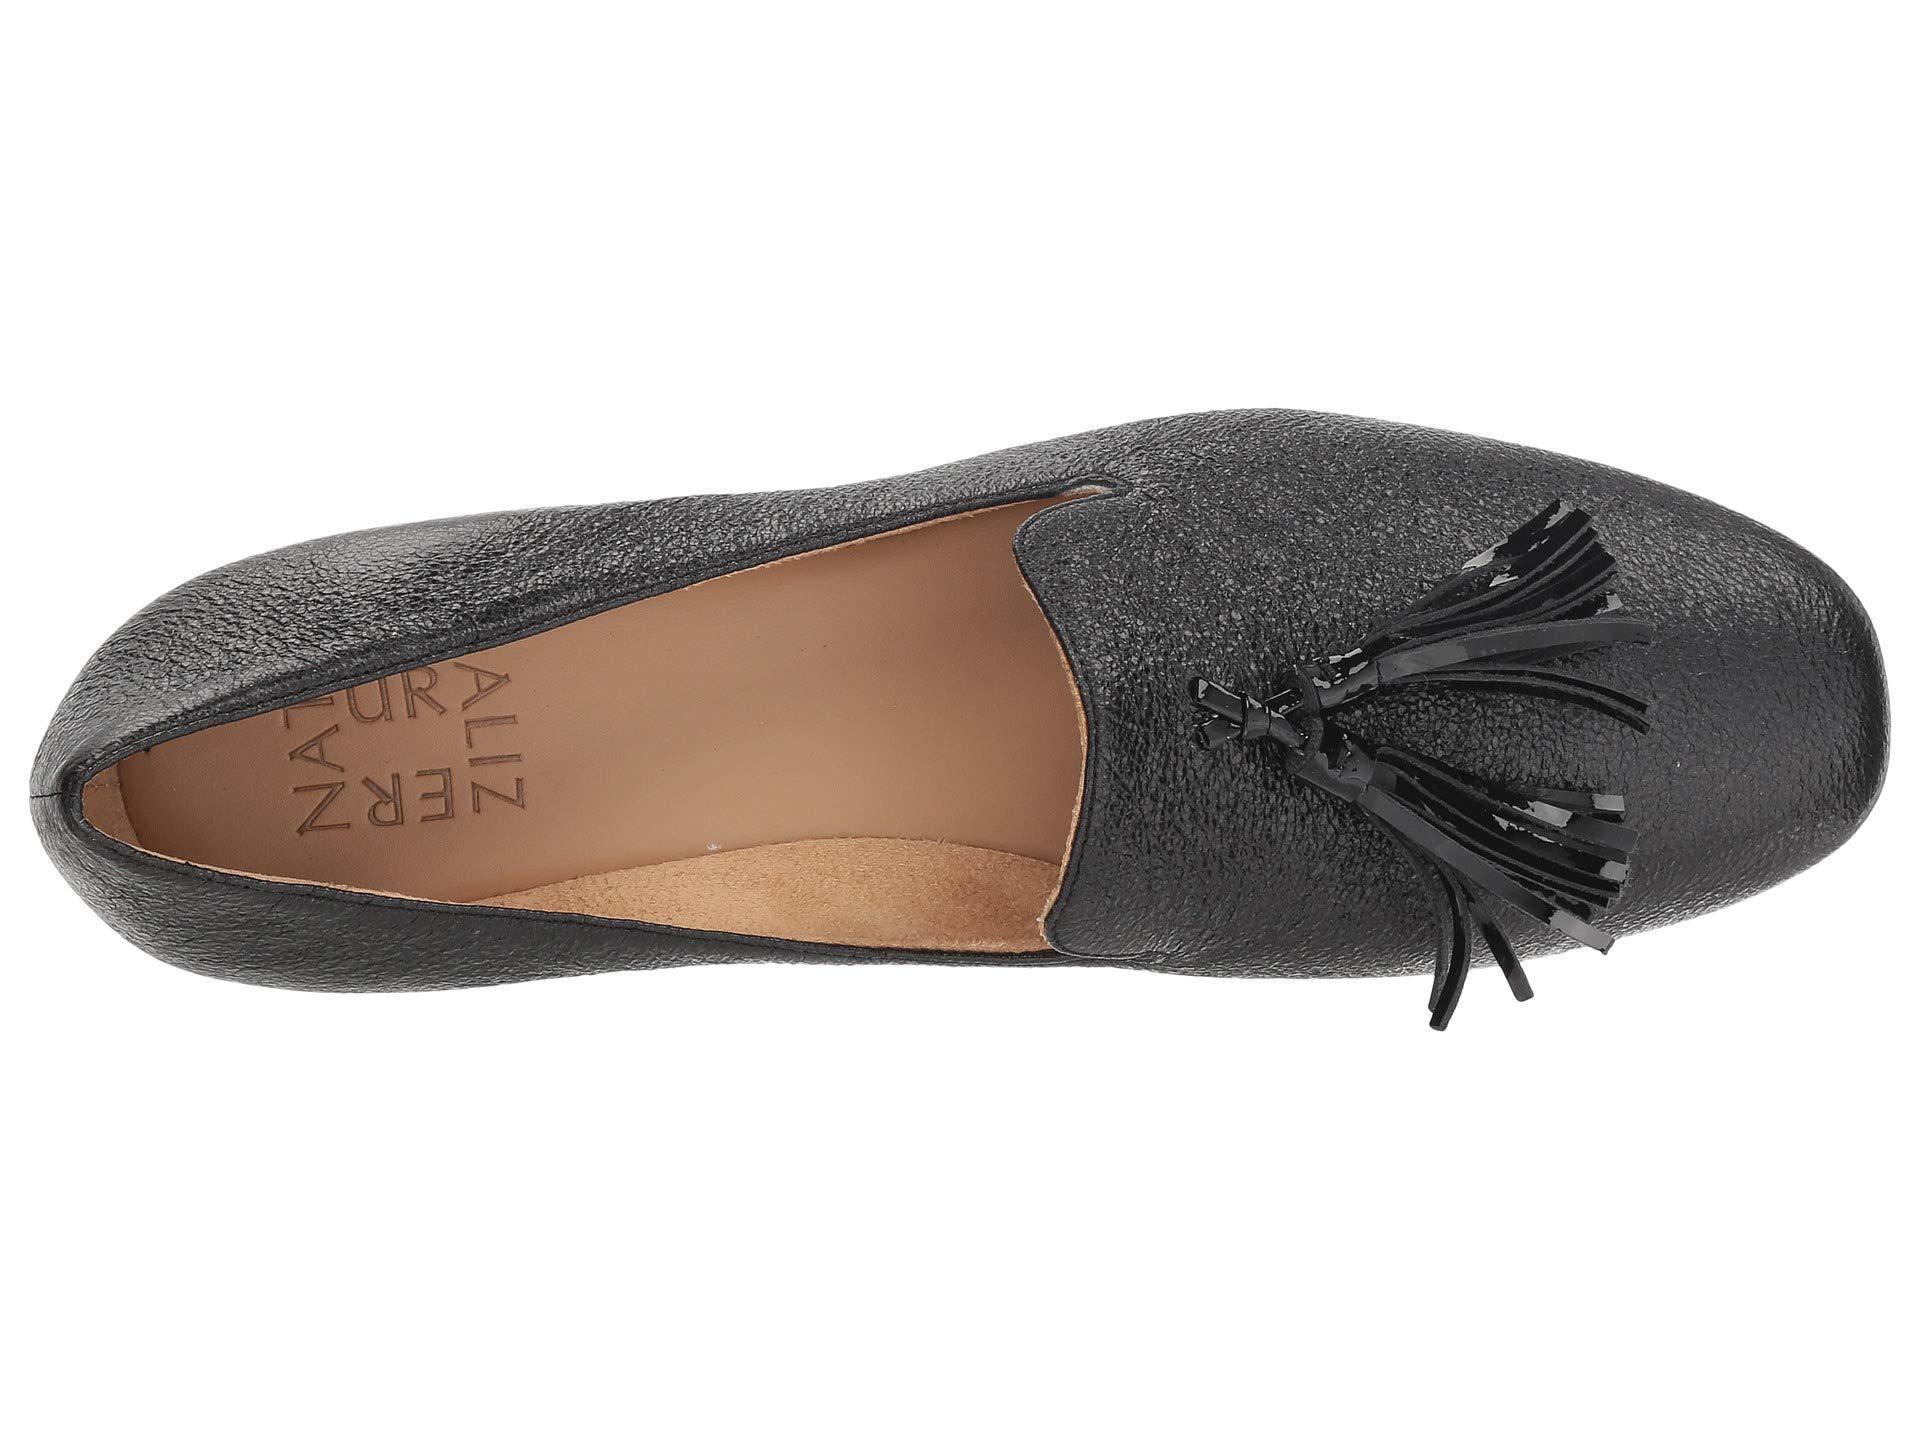 ff9ffaf4507 Naturalizer - Multicolor Elly (black Sparkle Metallic Leather) Women s Flat  Shoes - Lyst. View fullscreen